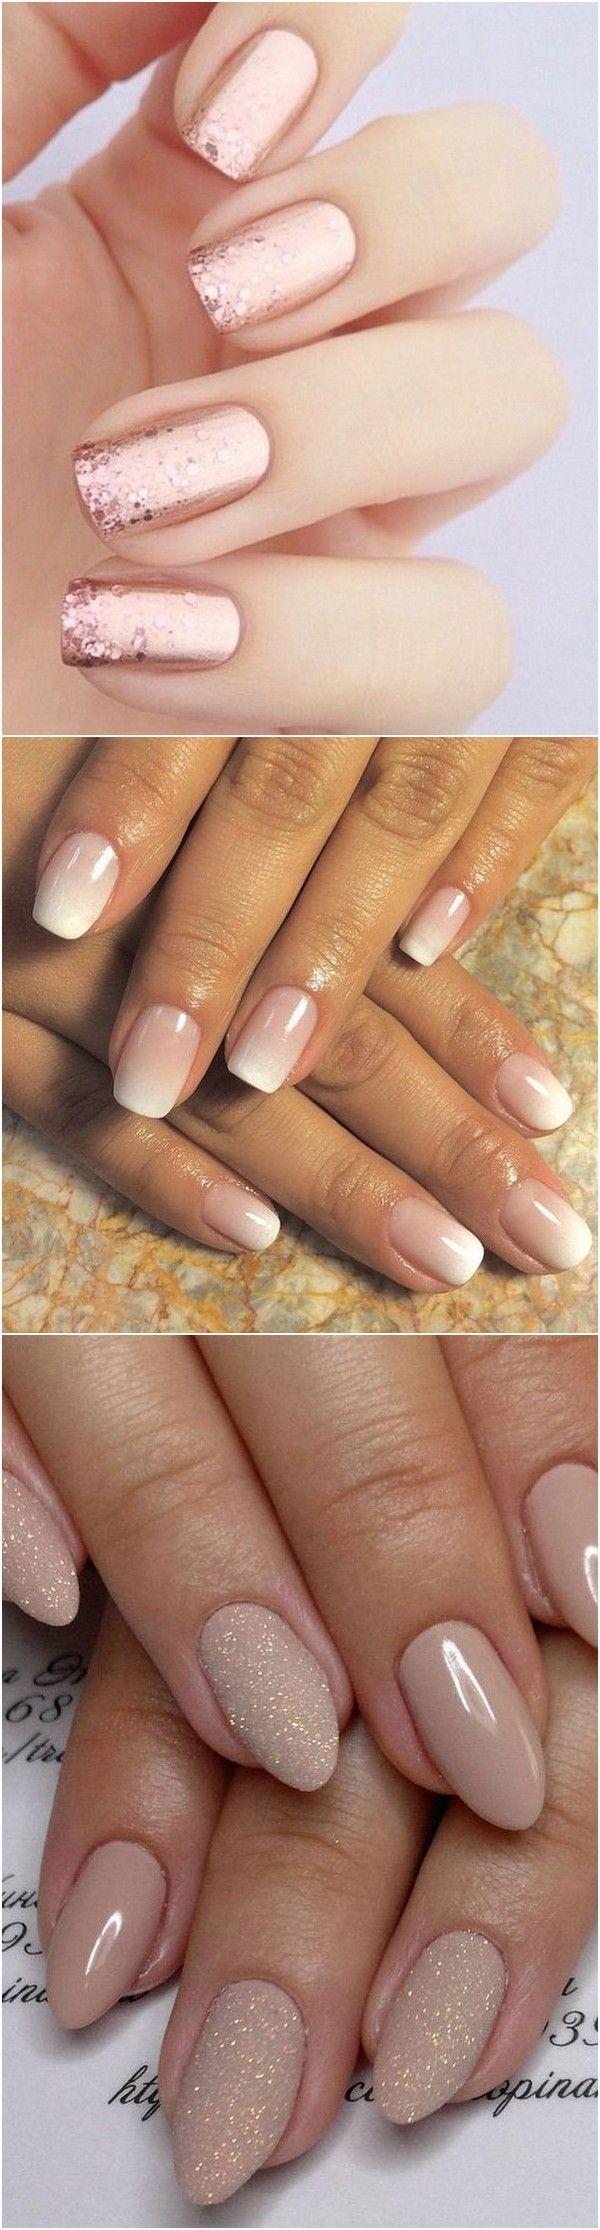 Wedding nail design ideas #wedding #bridalfashion #bridalnails | Top ...